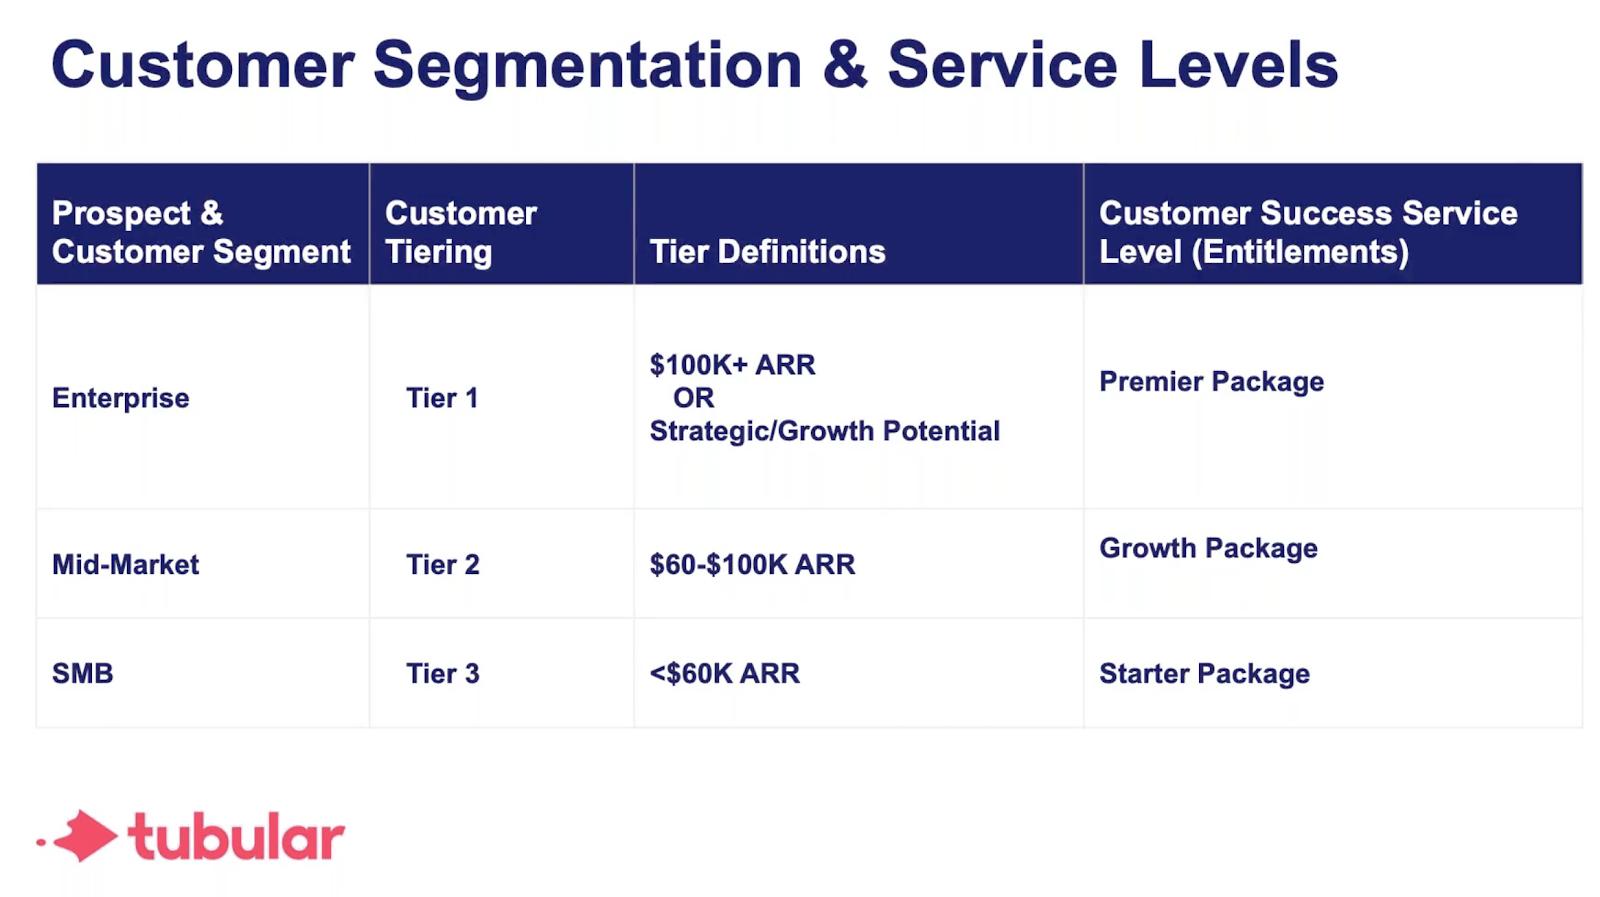 Customer Segmentation and Service Levels